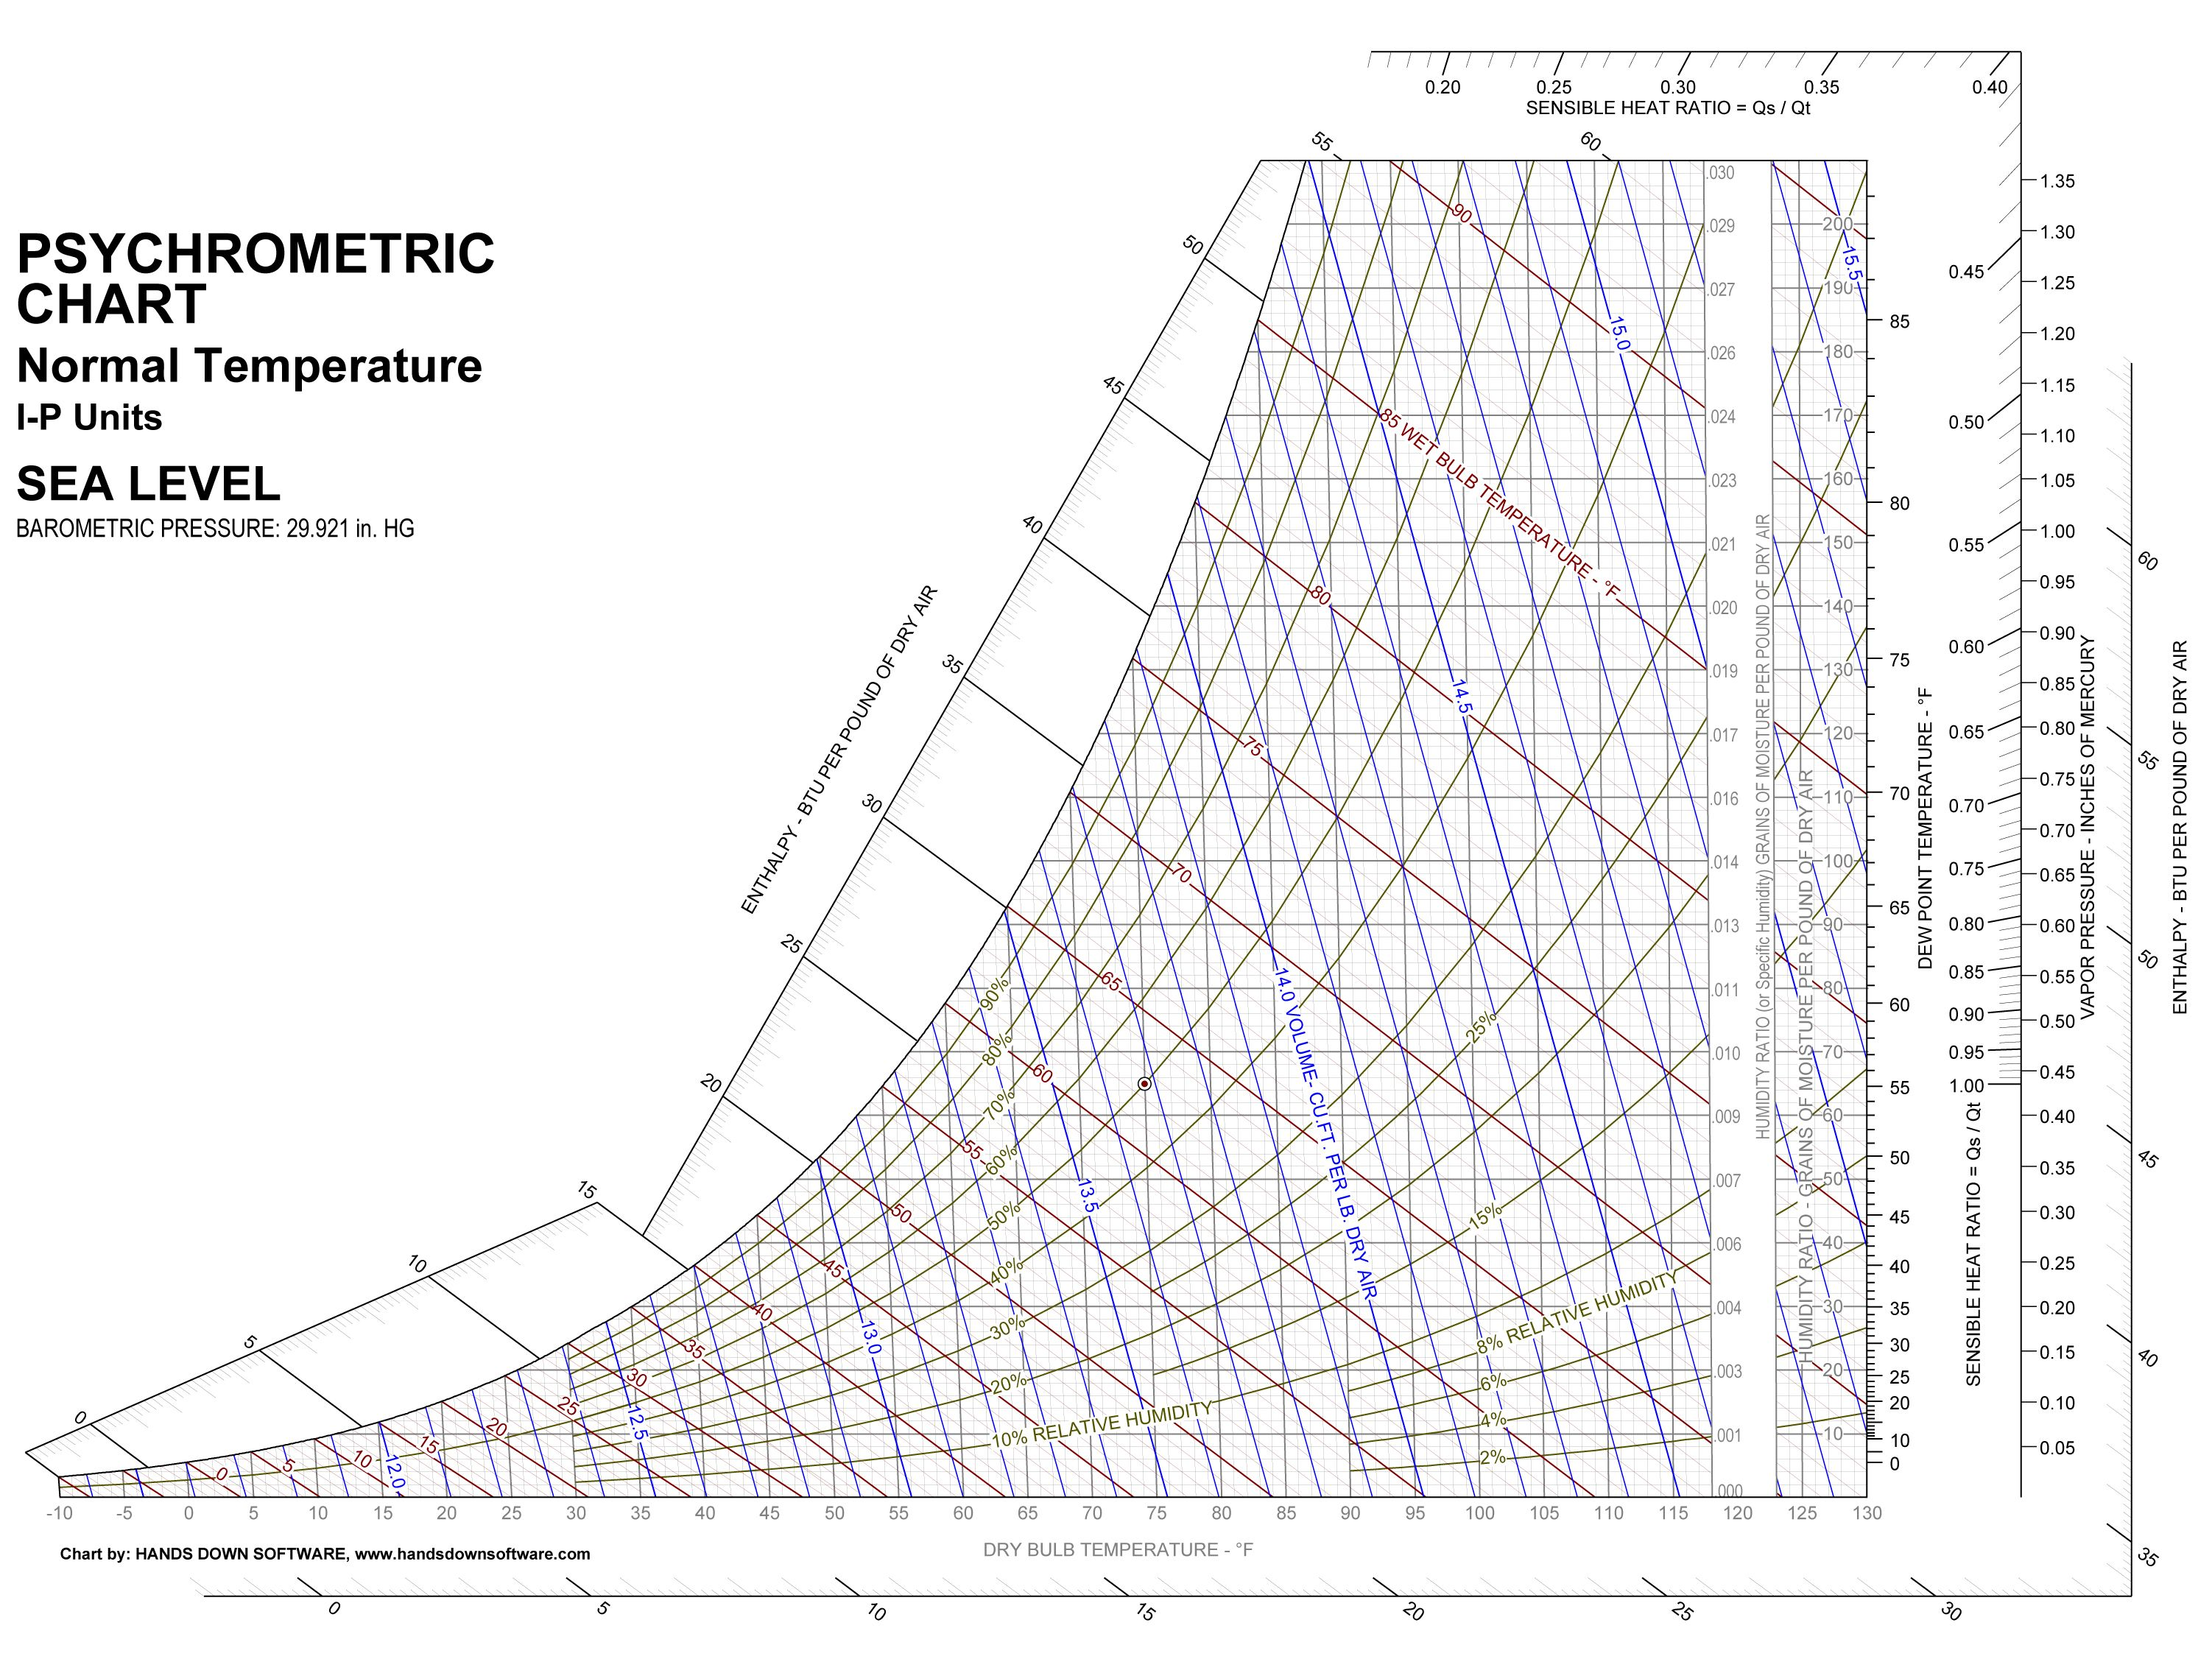 photo about Printable Psychrometric Chart referred to as Printable Psychrometric Chart งานสอน Chart, Printables